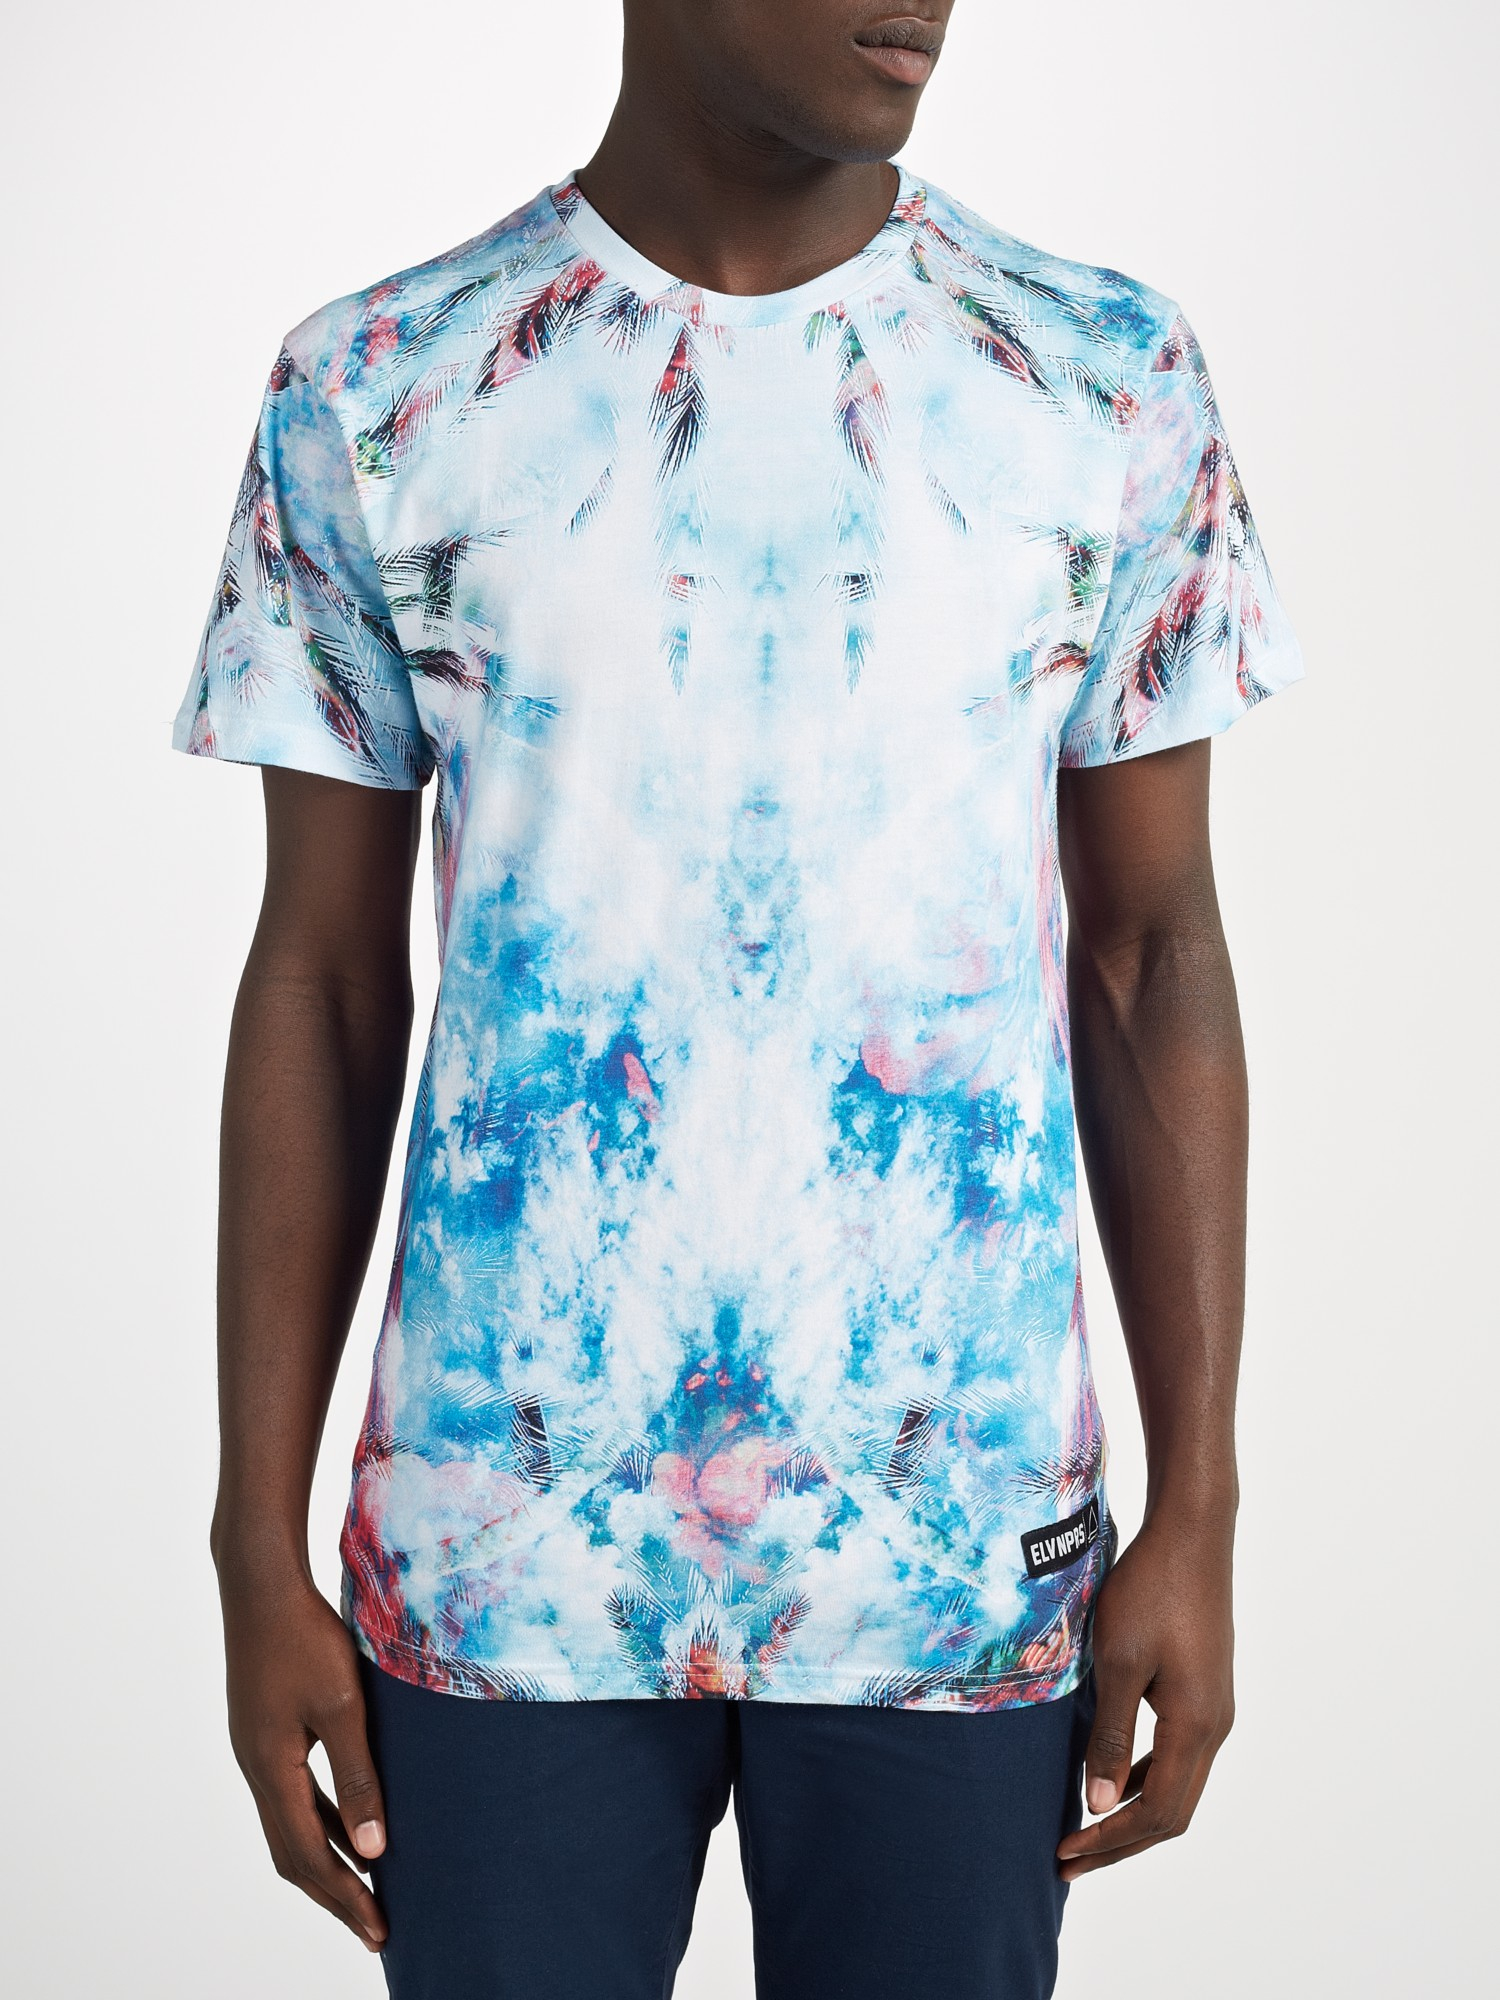 eleven paris ocean palm print t shirt in blue for men lyst. Black Bedroom Furniture Sets. Home Design Ideas